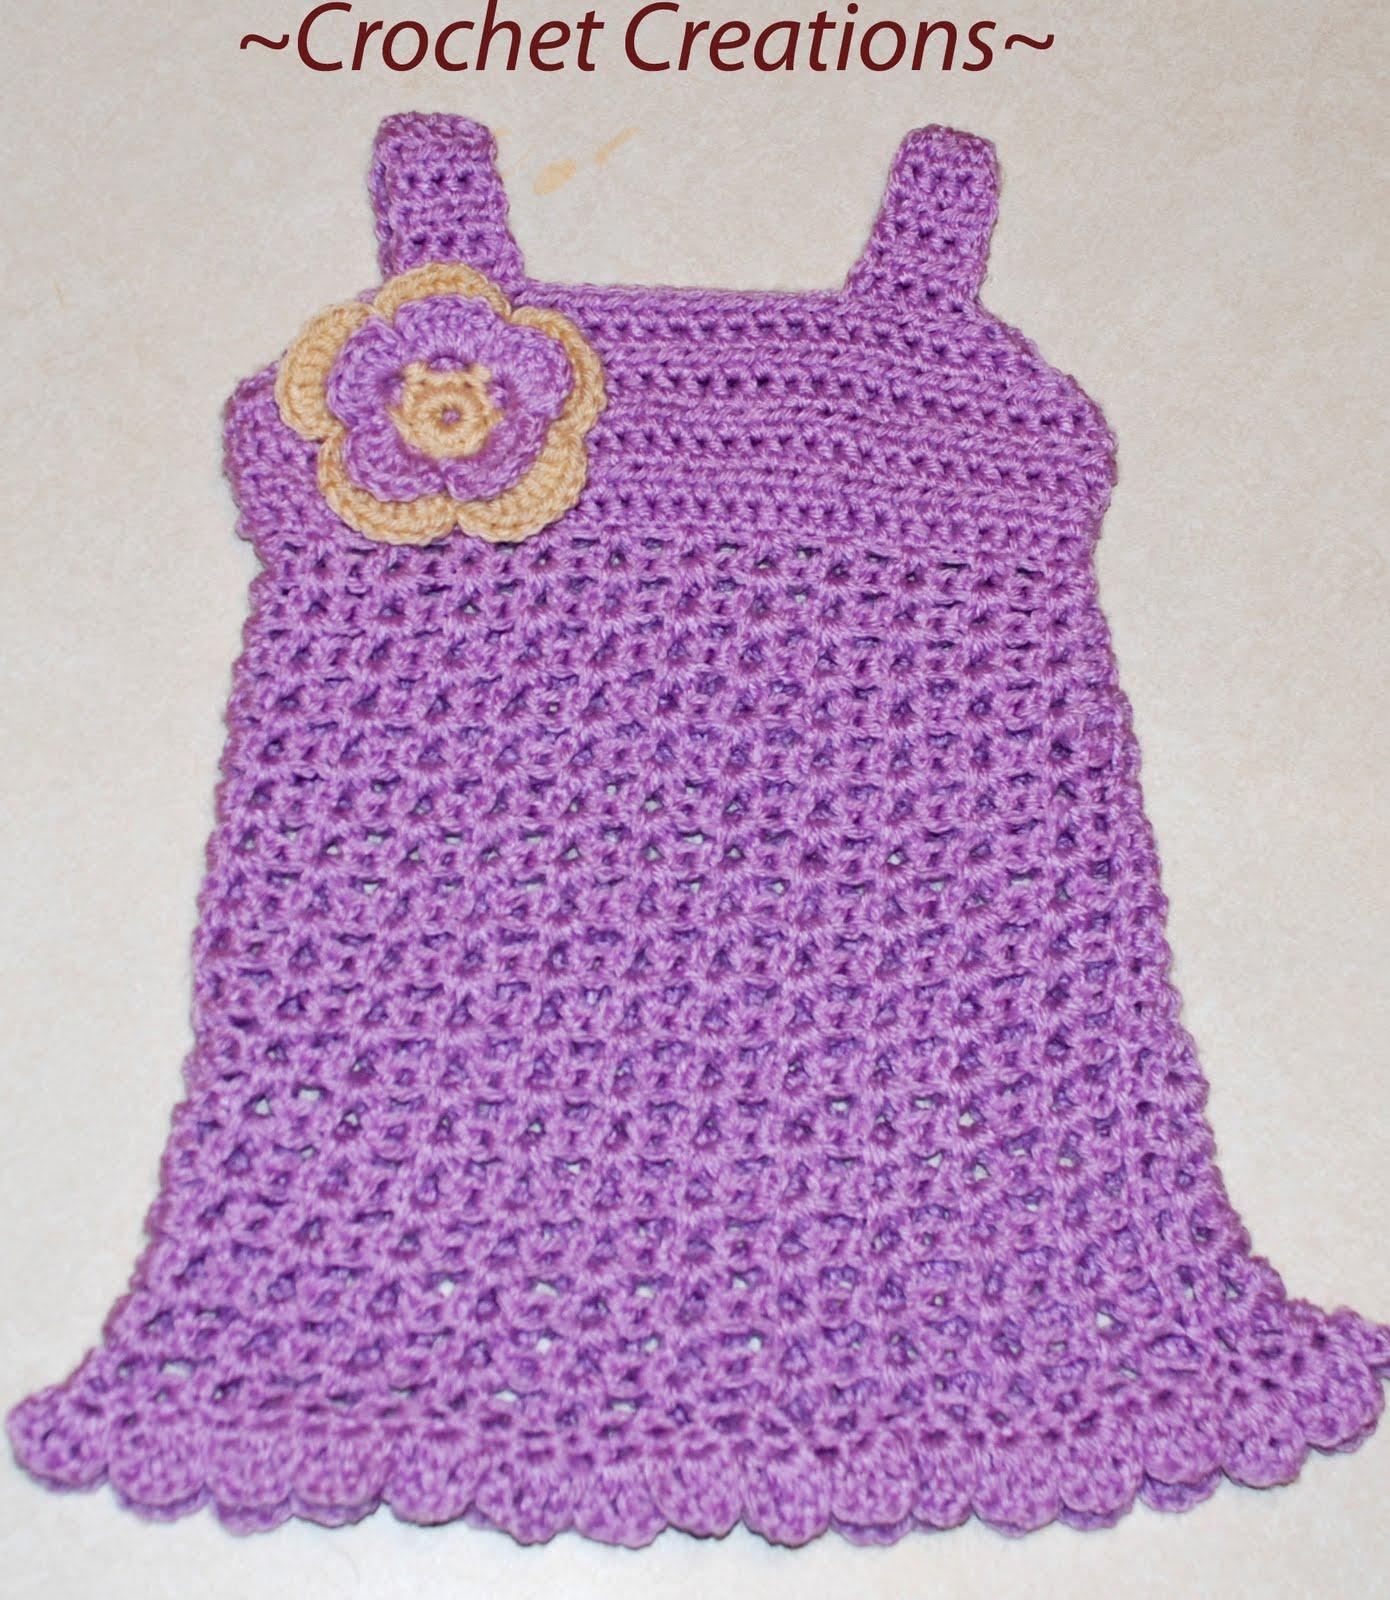 Crochet Patterns Toddler Dress : Crochet pattern baby to toddler dress (Crochet dress): Luz Mendoza